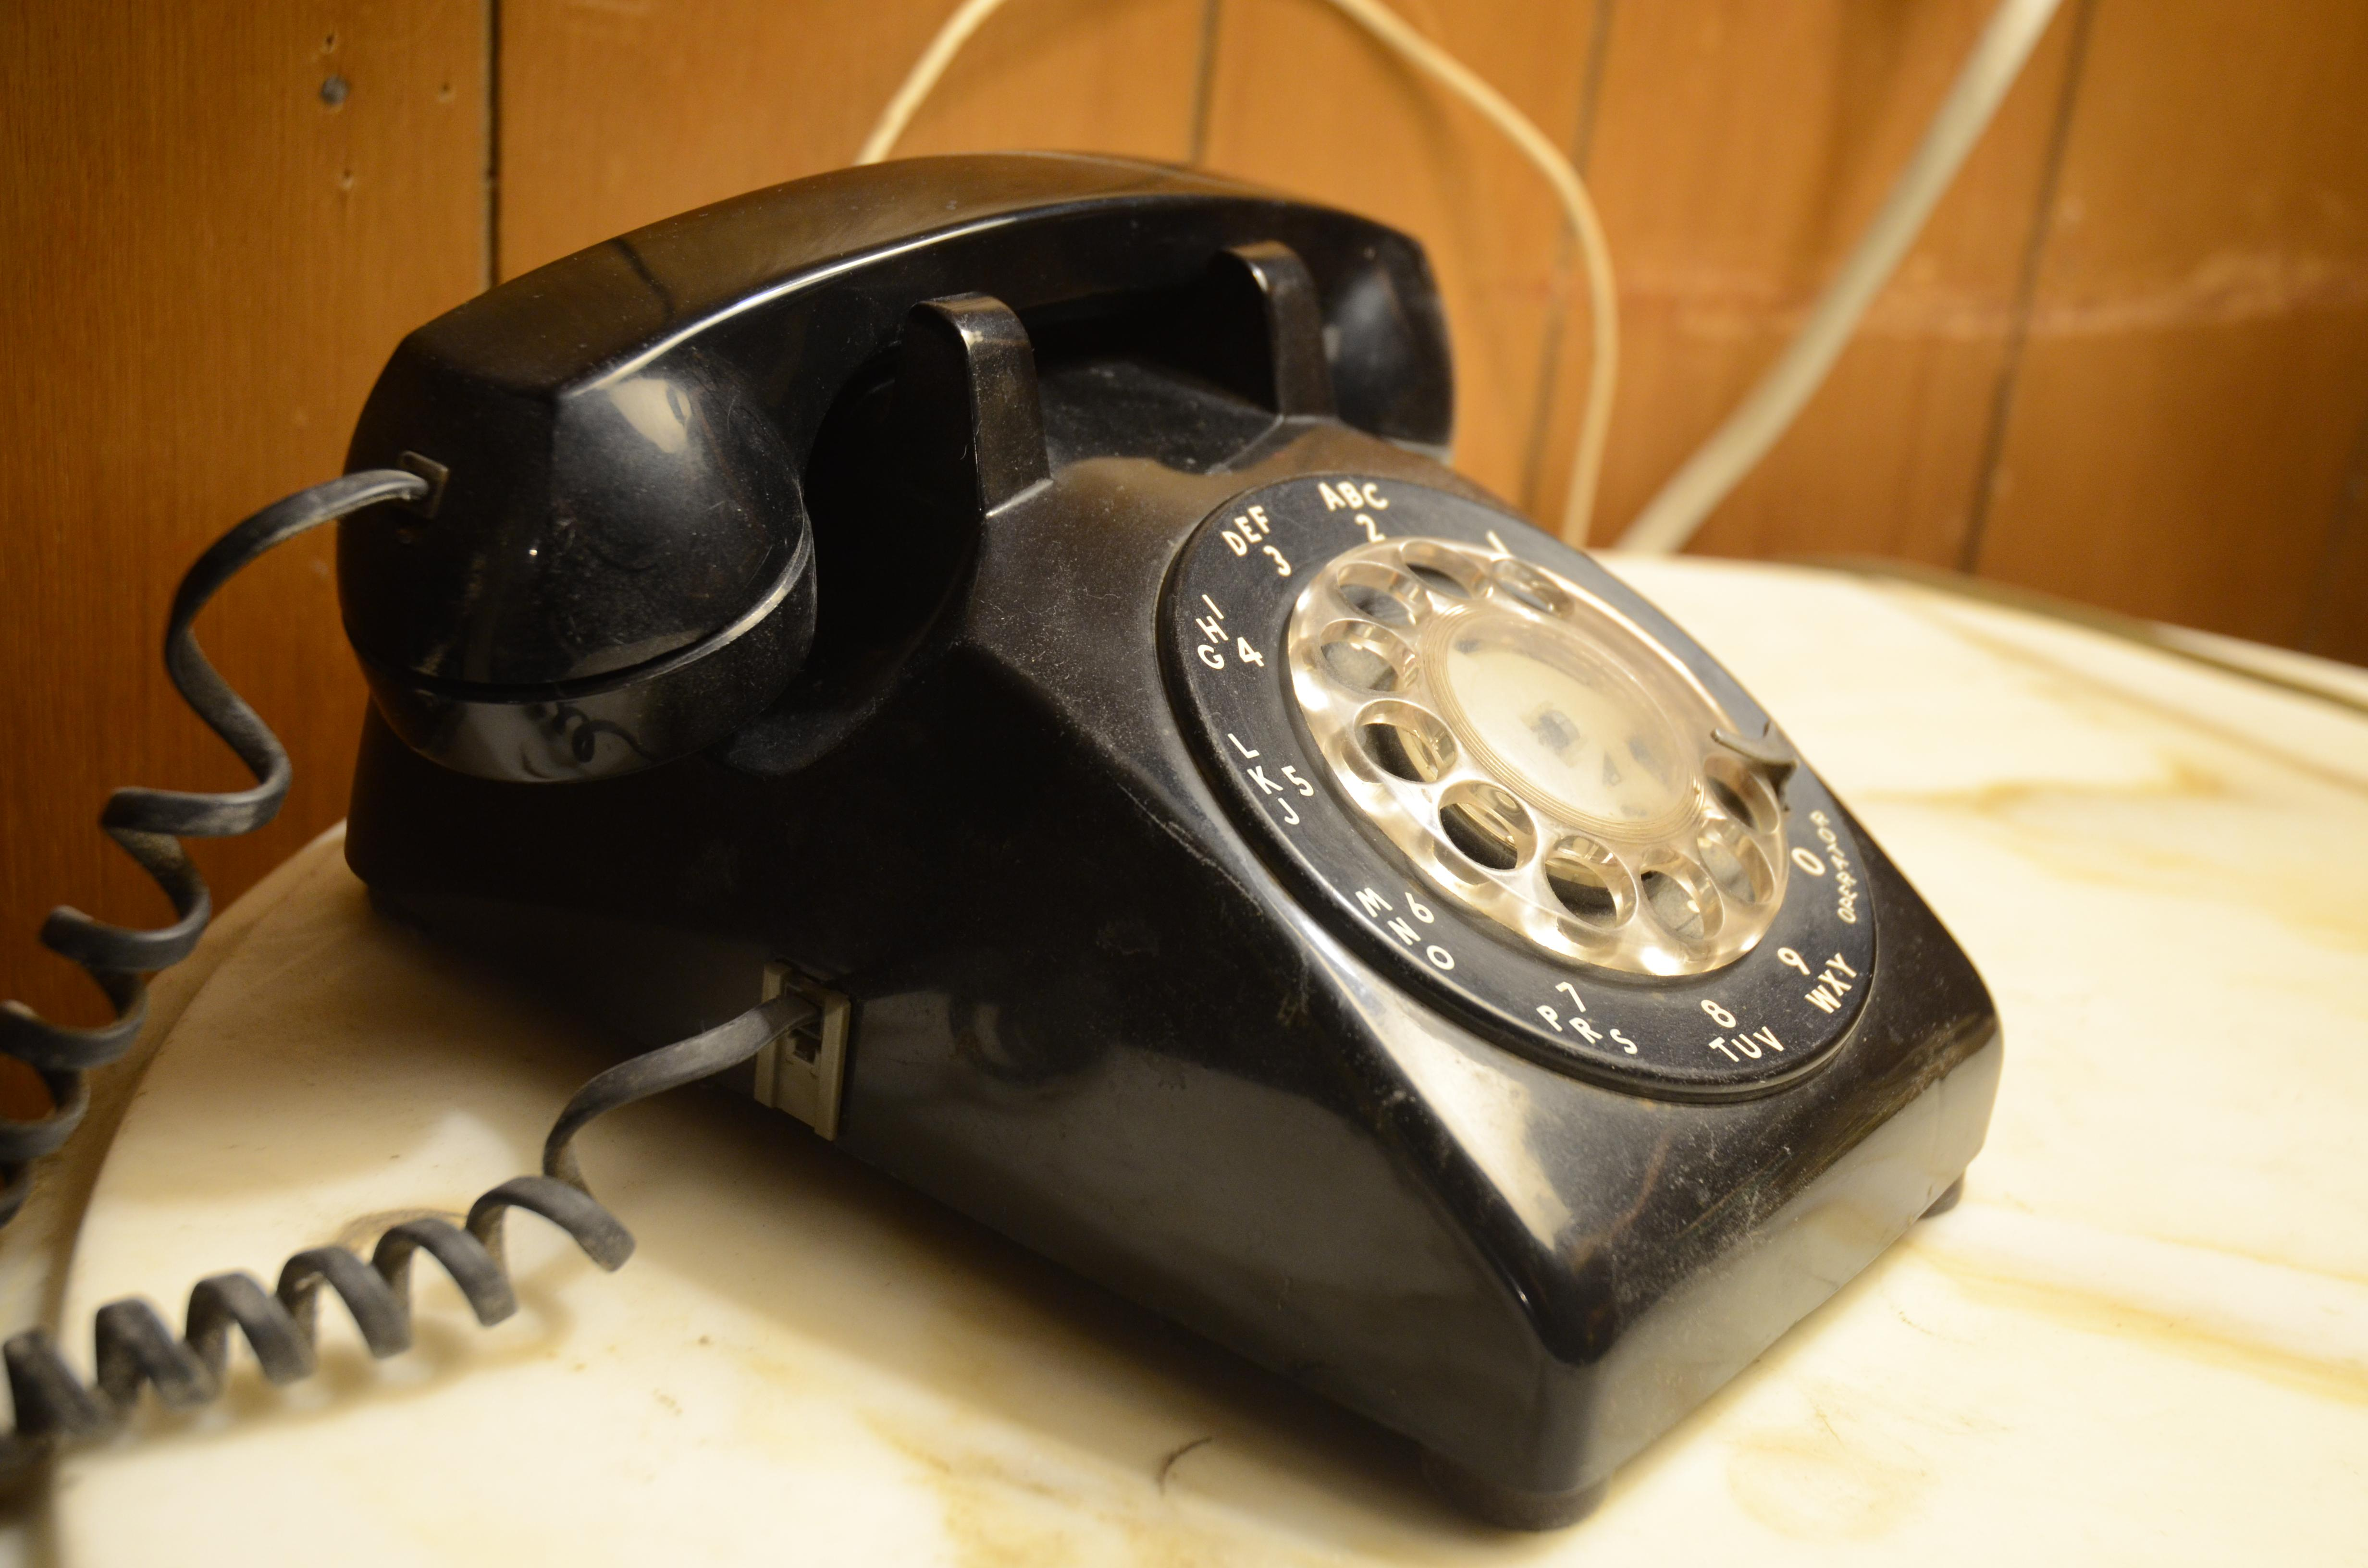 Phone scammers target Mishawaka, Elkhart residents